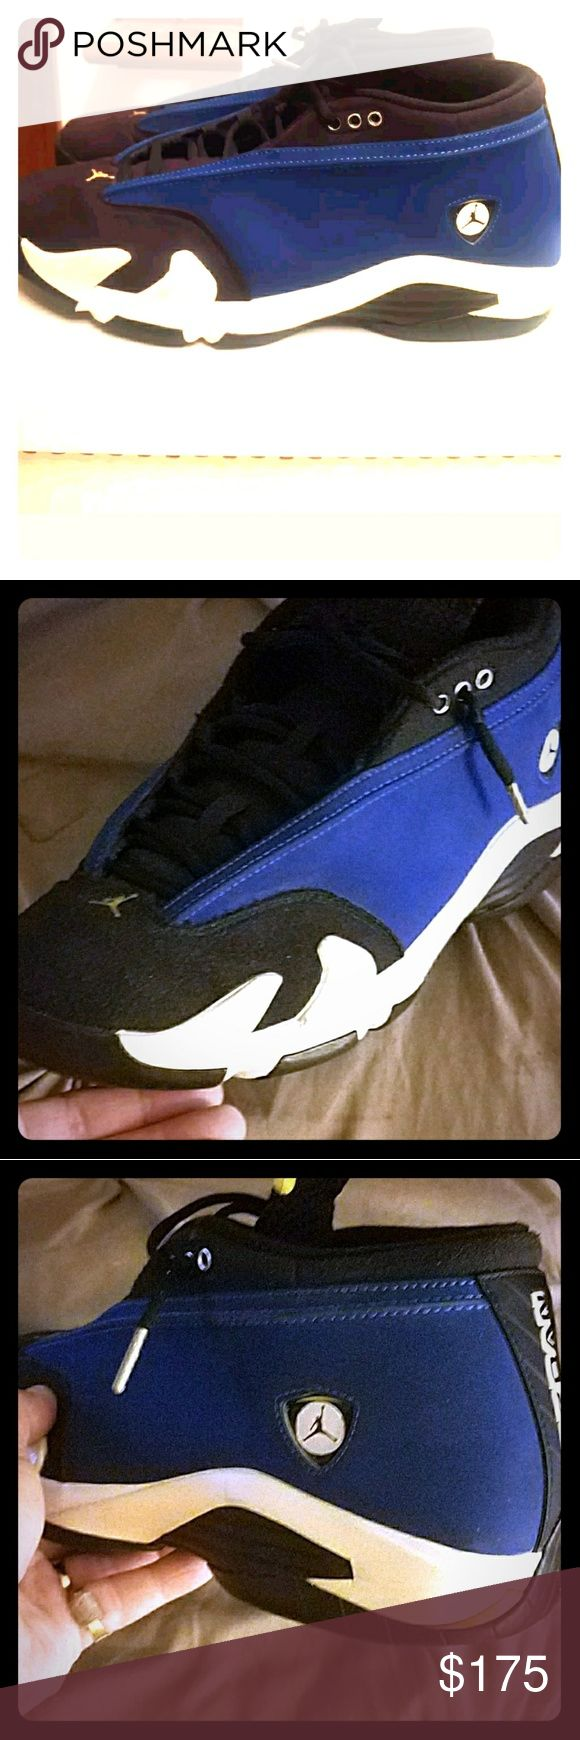 Jordan 14 low Laney's Like new. Only worn a few times... NO BOX Very clean shoe Jordan Shoes Sneakers